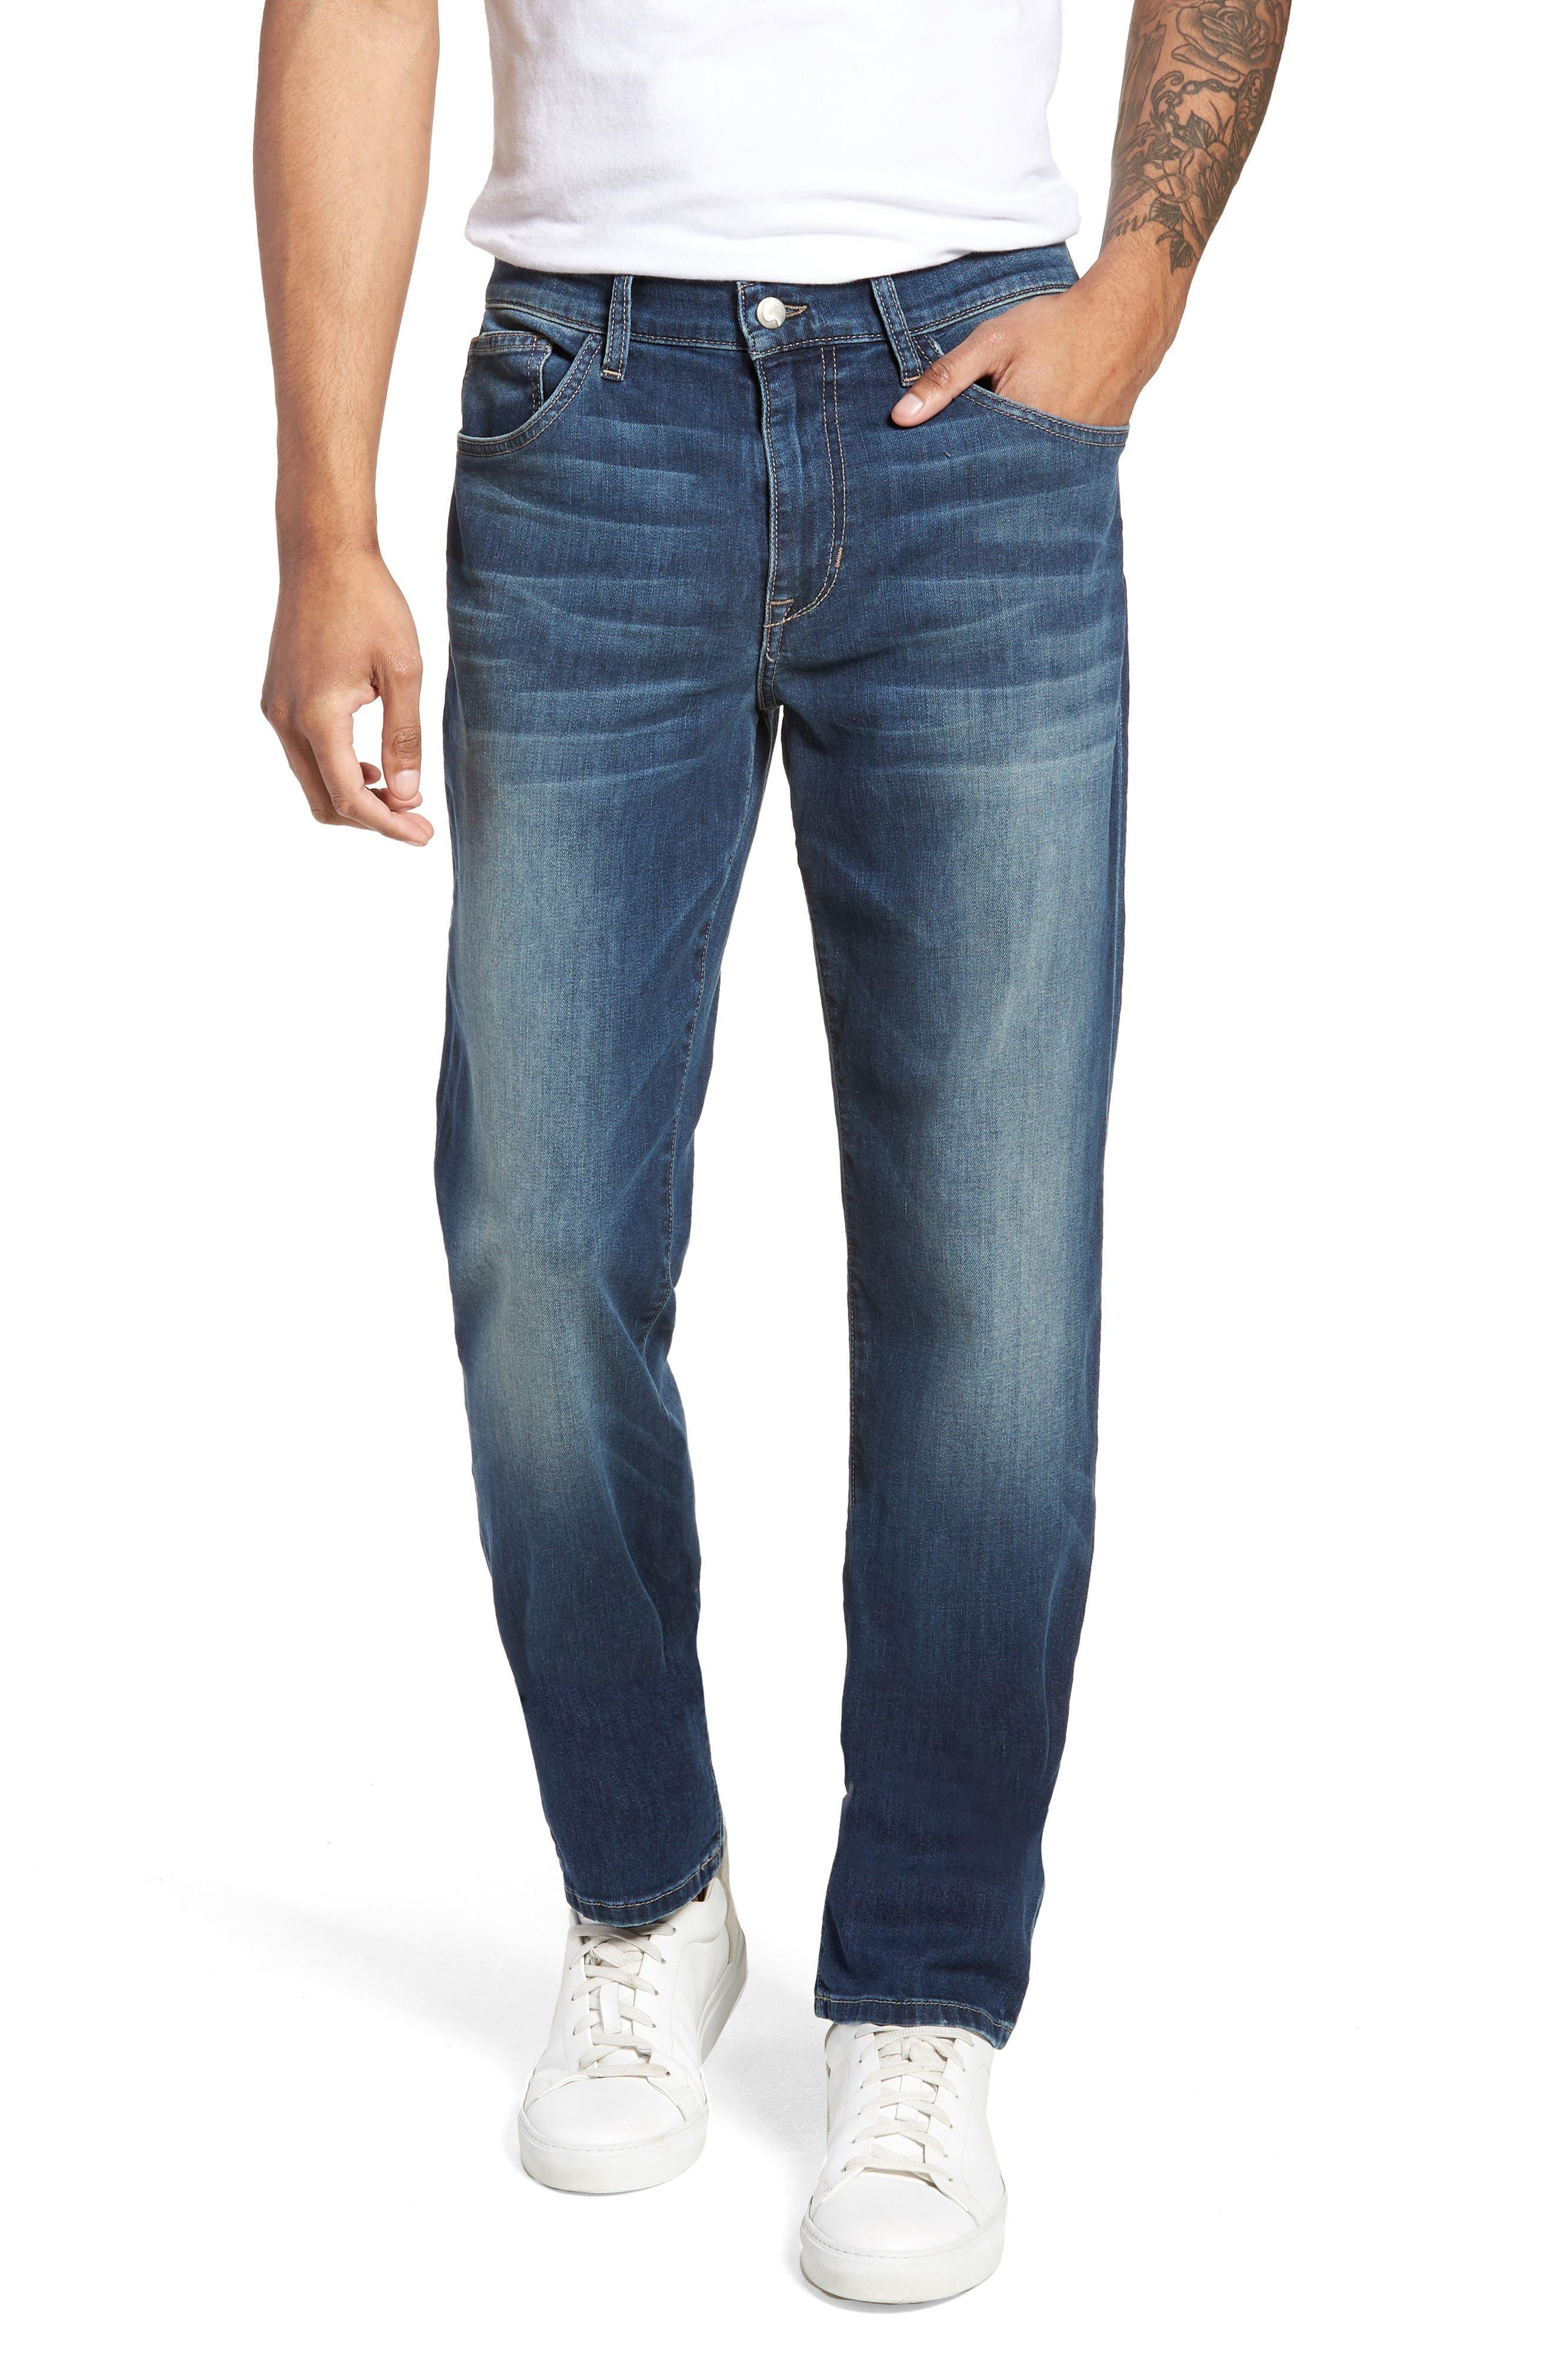 Brixton Slim Straight Fit Jeans,                             Main thumbnail 1, color,                             Brady